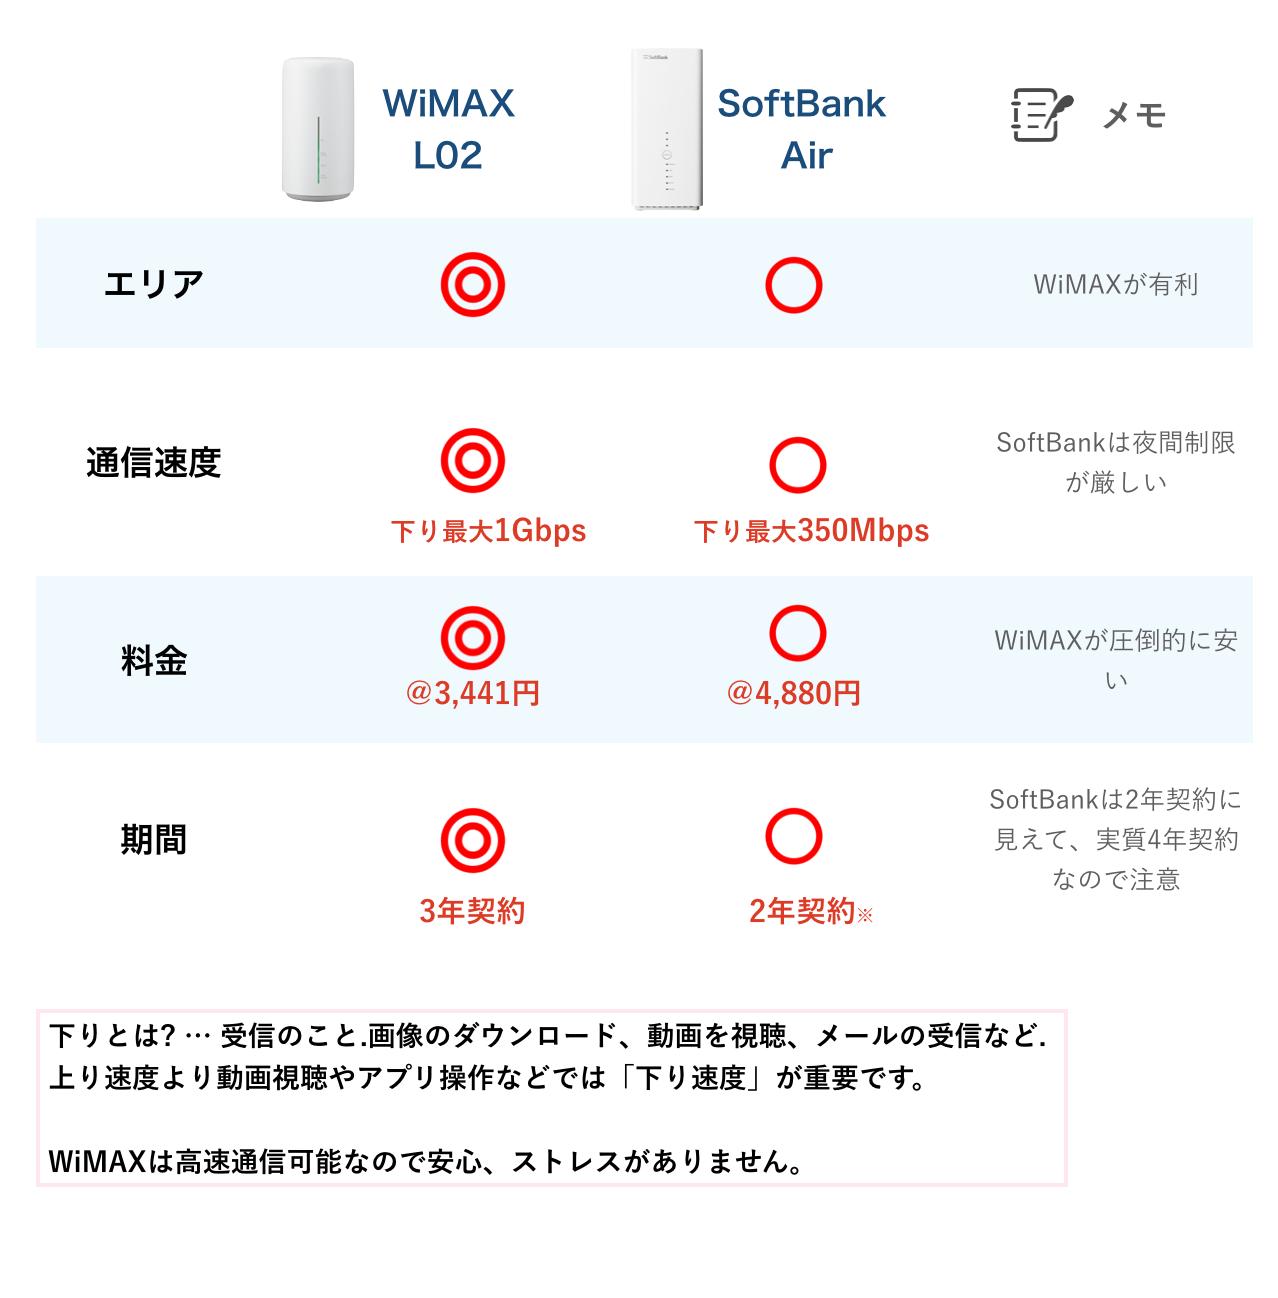 wimaxホームルーターL02とソフトバンクAirの比較表